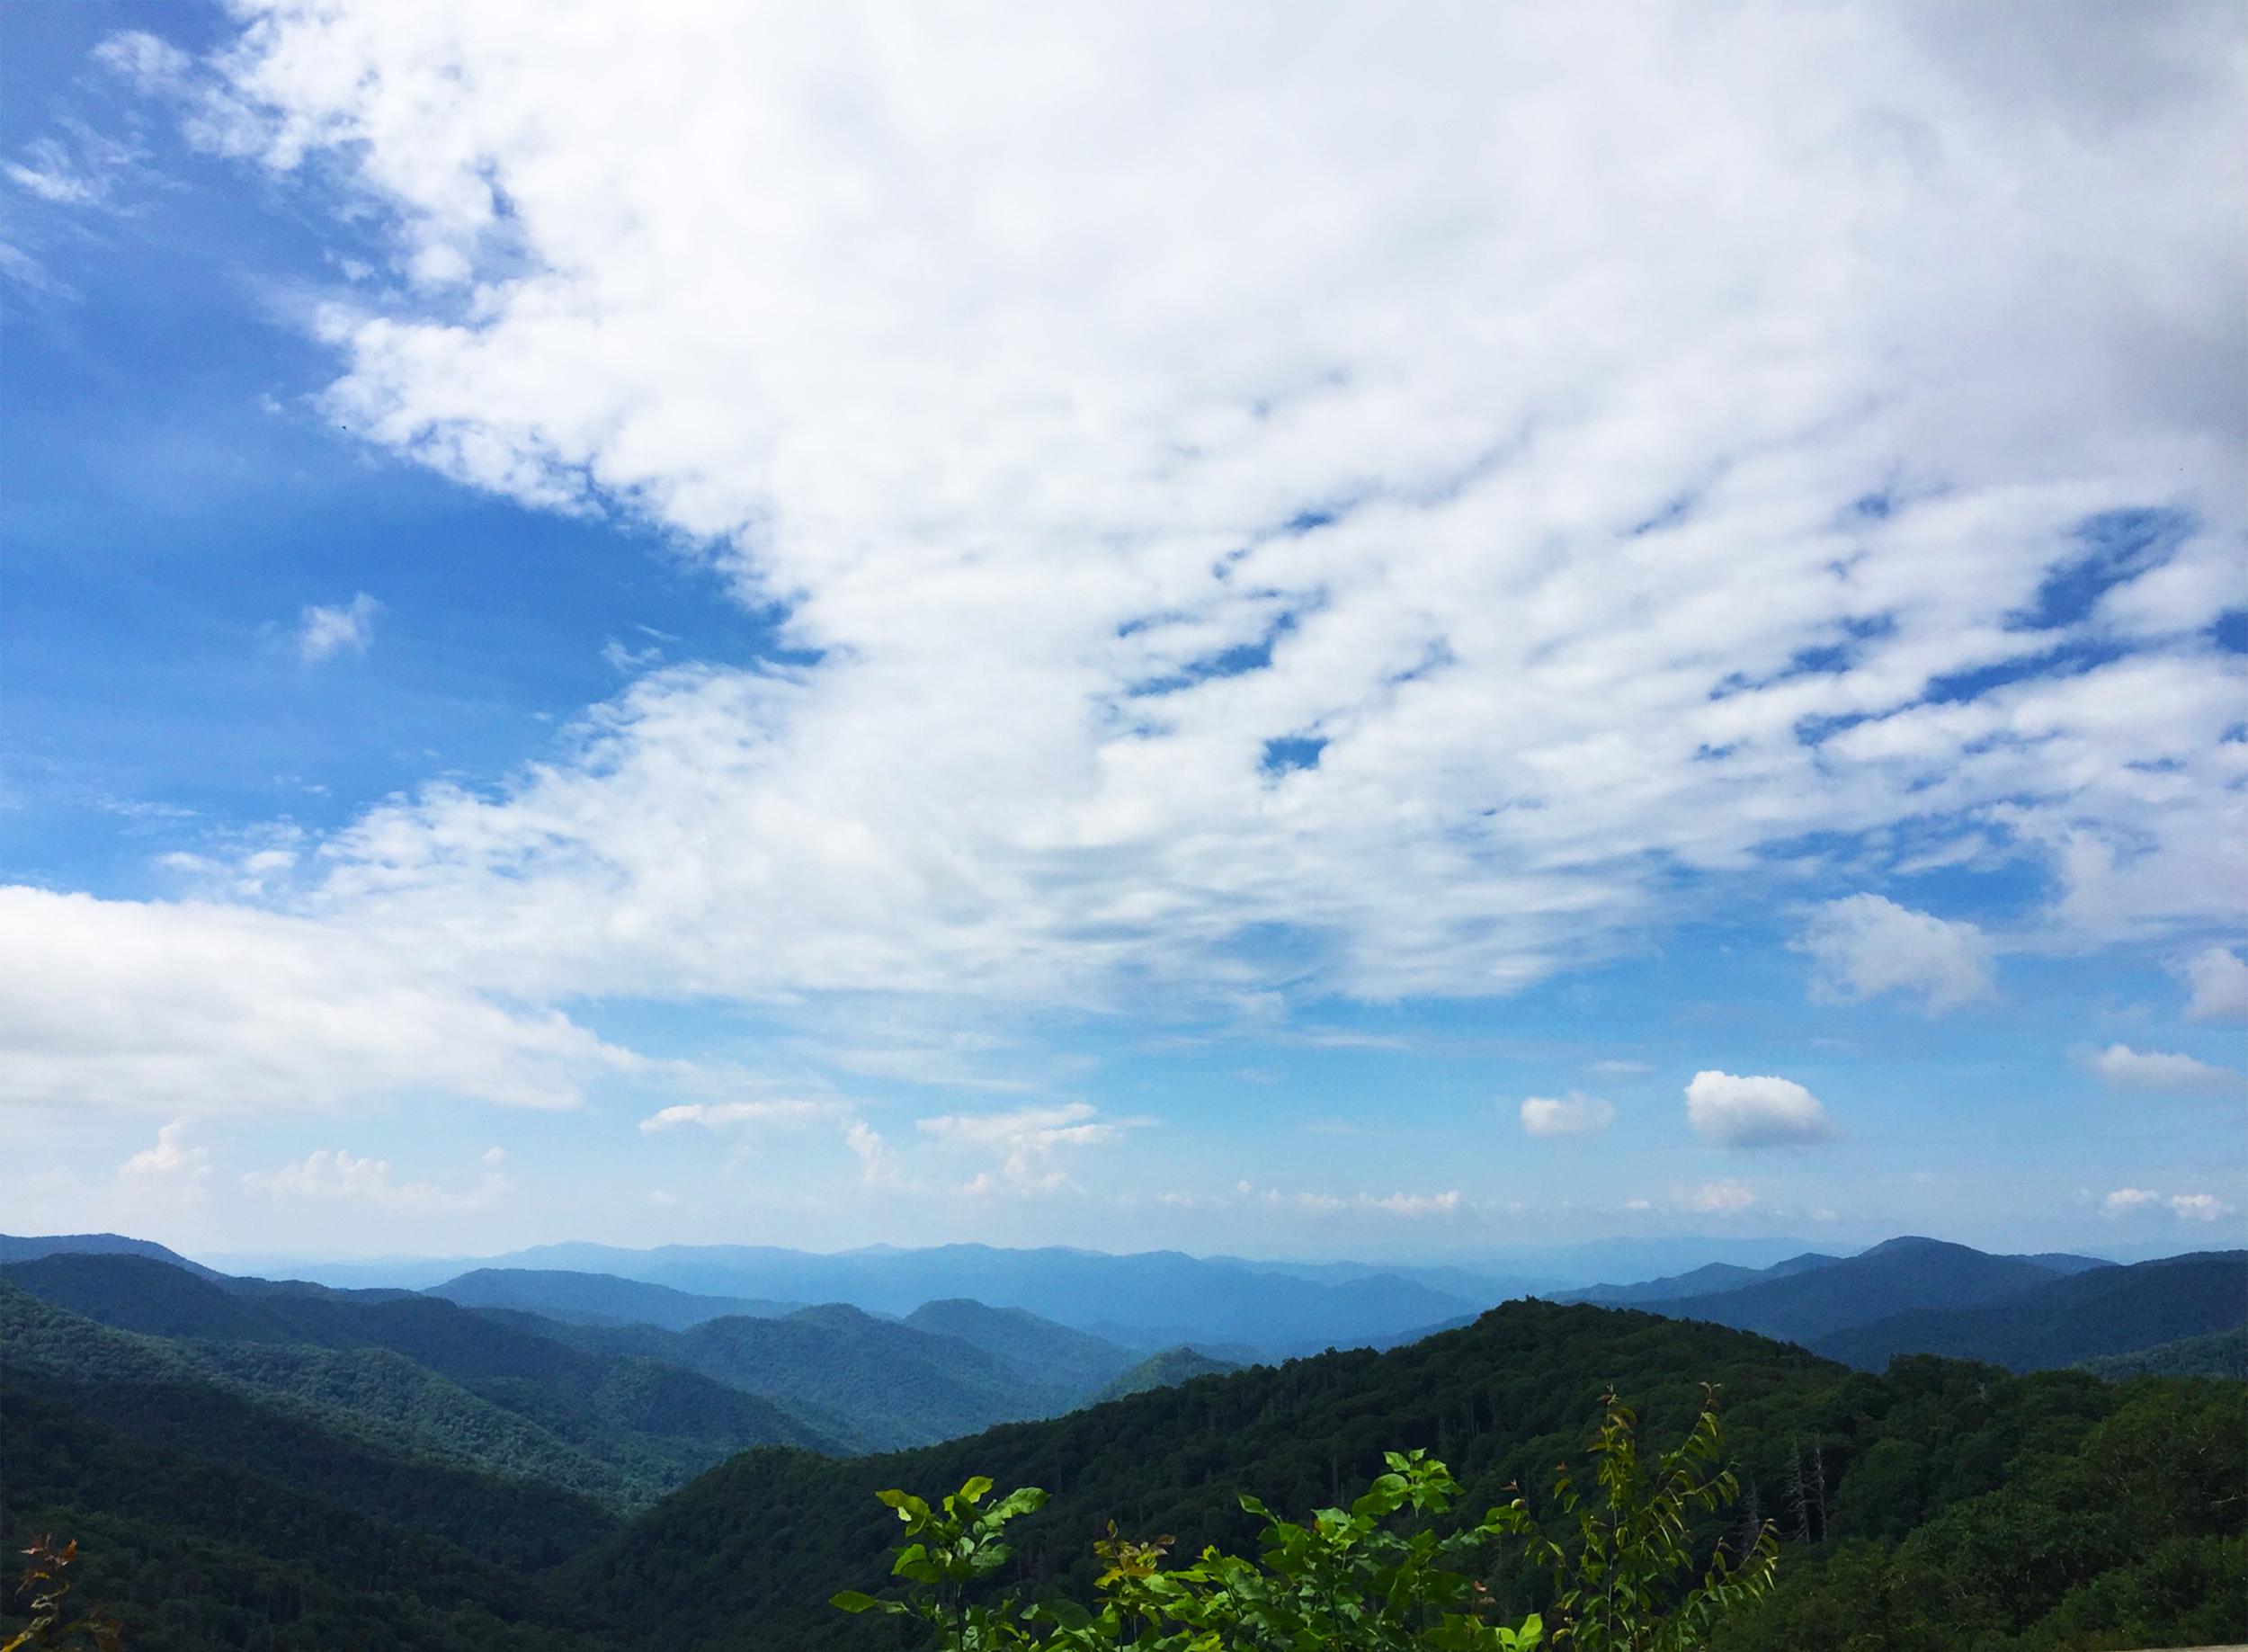 lisagilmoredesign. smokey mountain views. 1